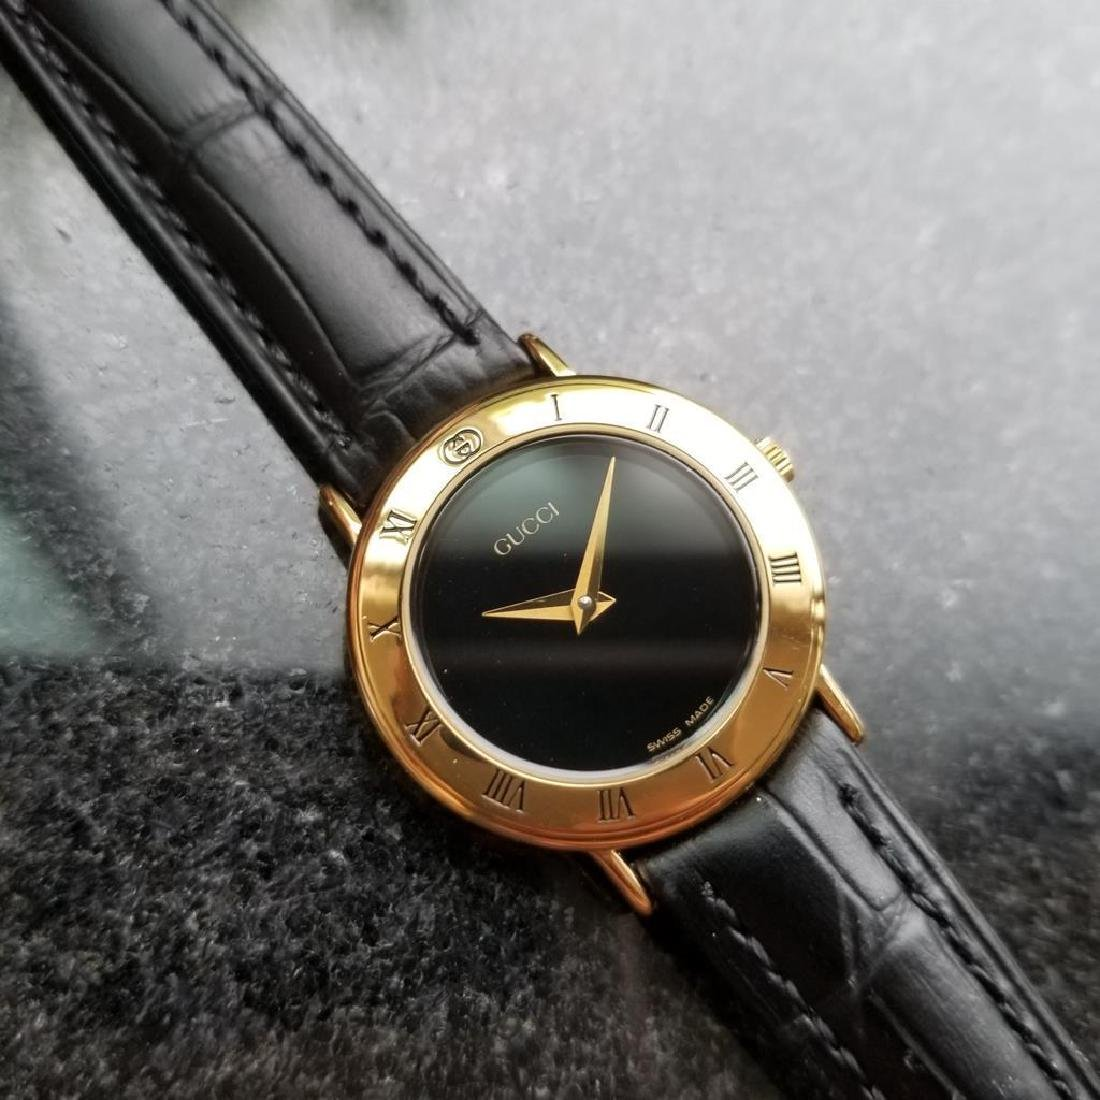 GUCCI Ladies Gold-Plated 3000.2.L Lux Swiss Dress Watch - 2